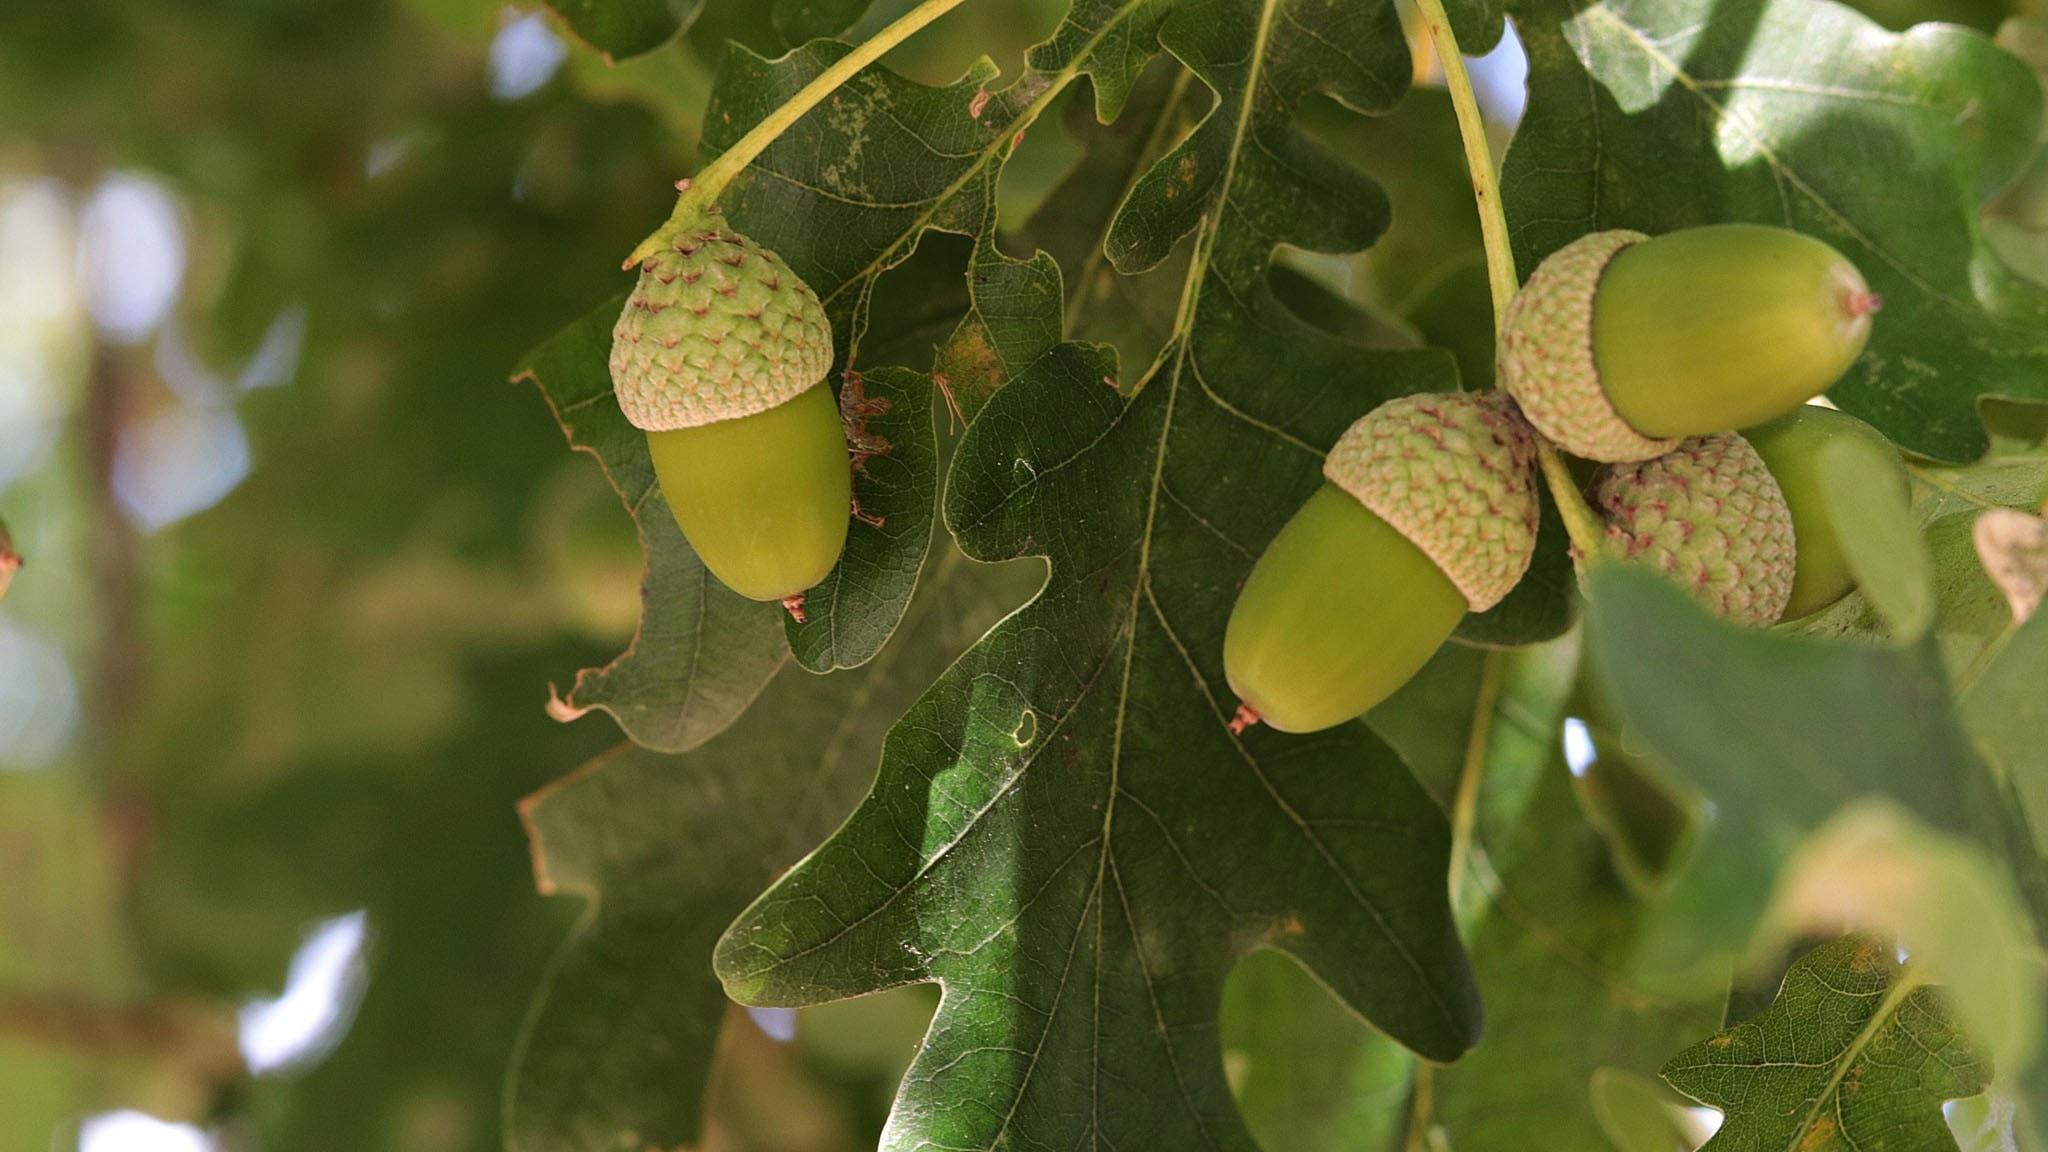 Bild på ekollon över ekblad.